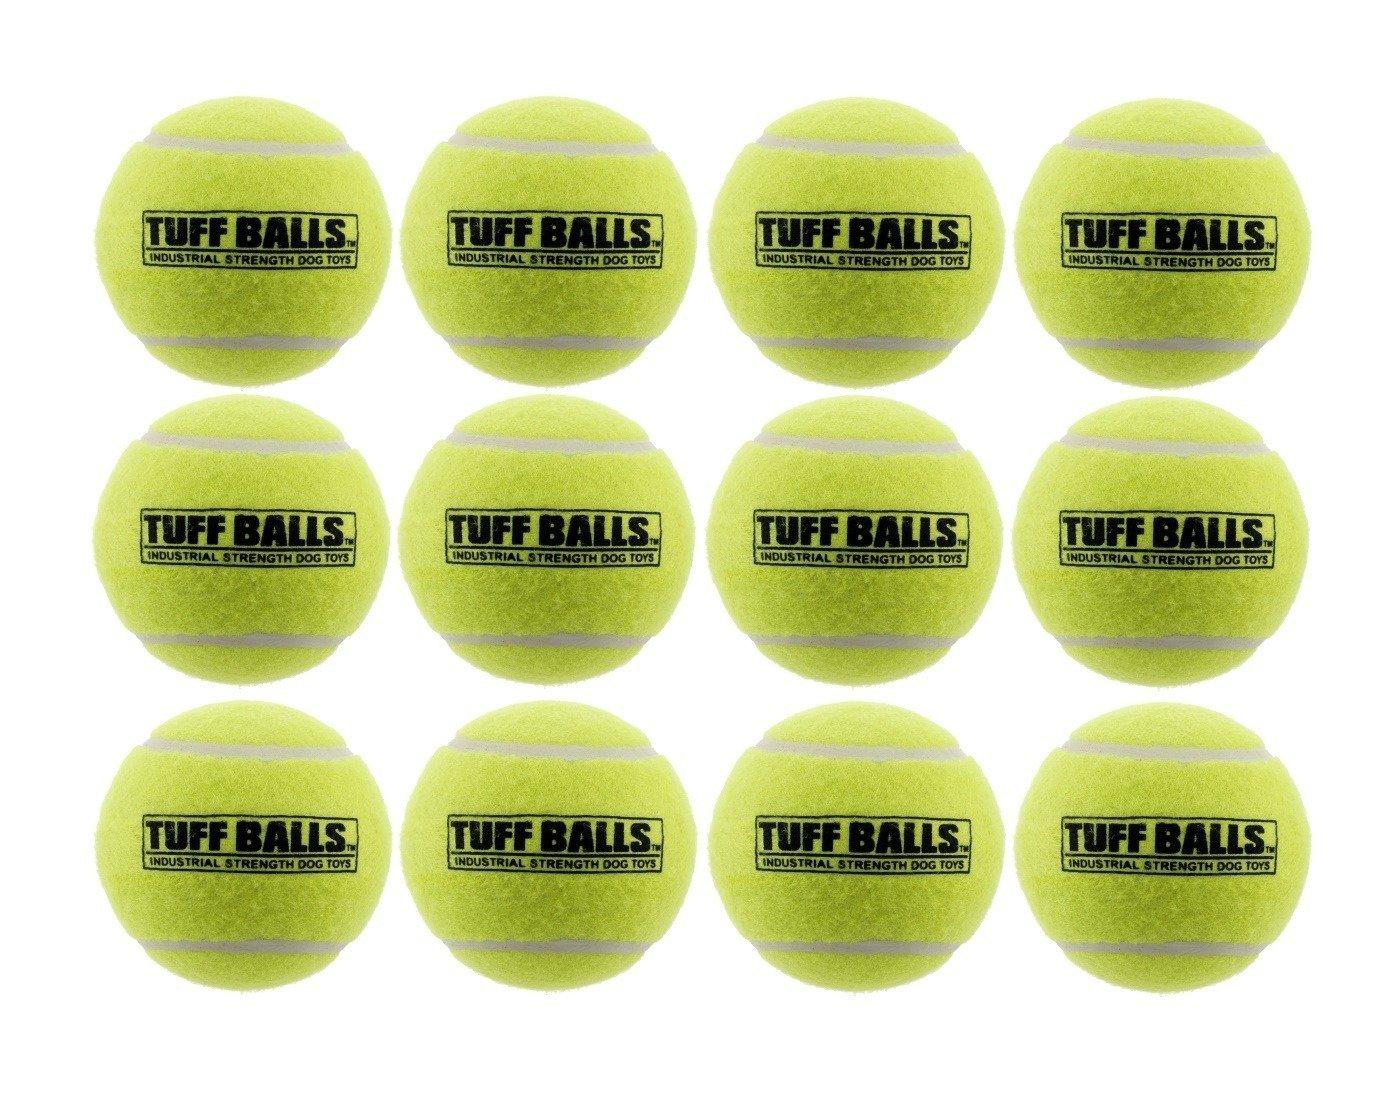 12 Tuff Balls - Industrial Strength Dog Toys 12 Pack, Standard, 2.5